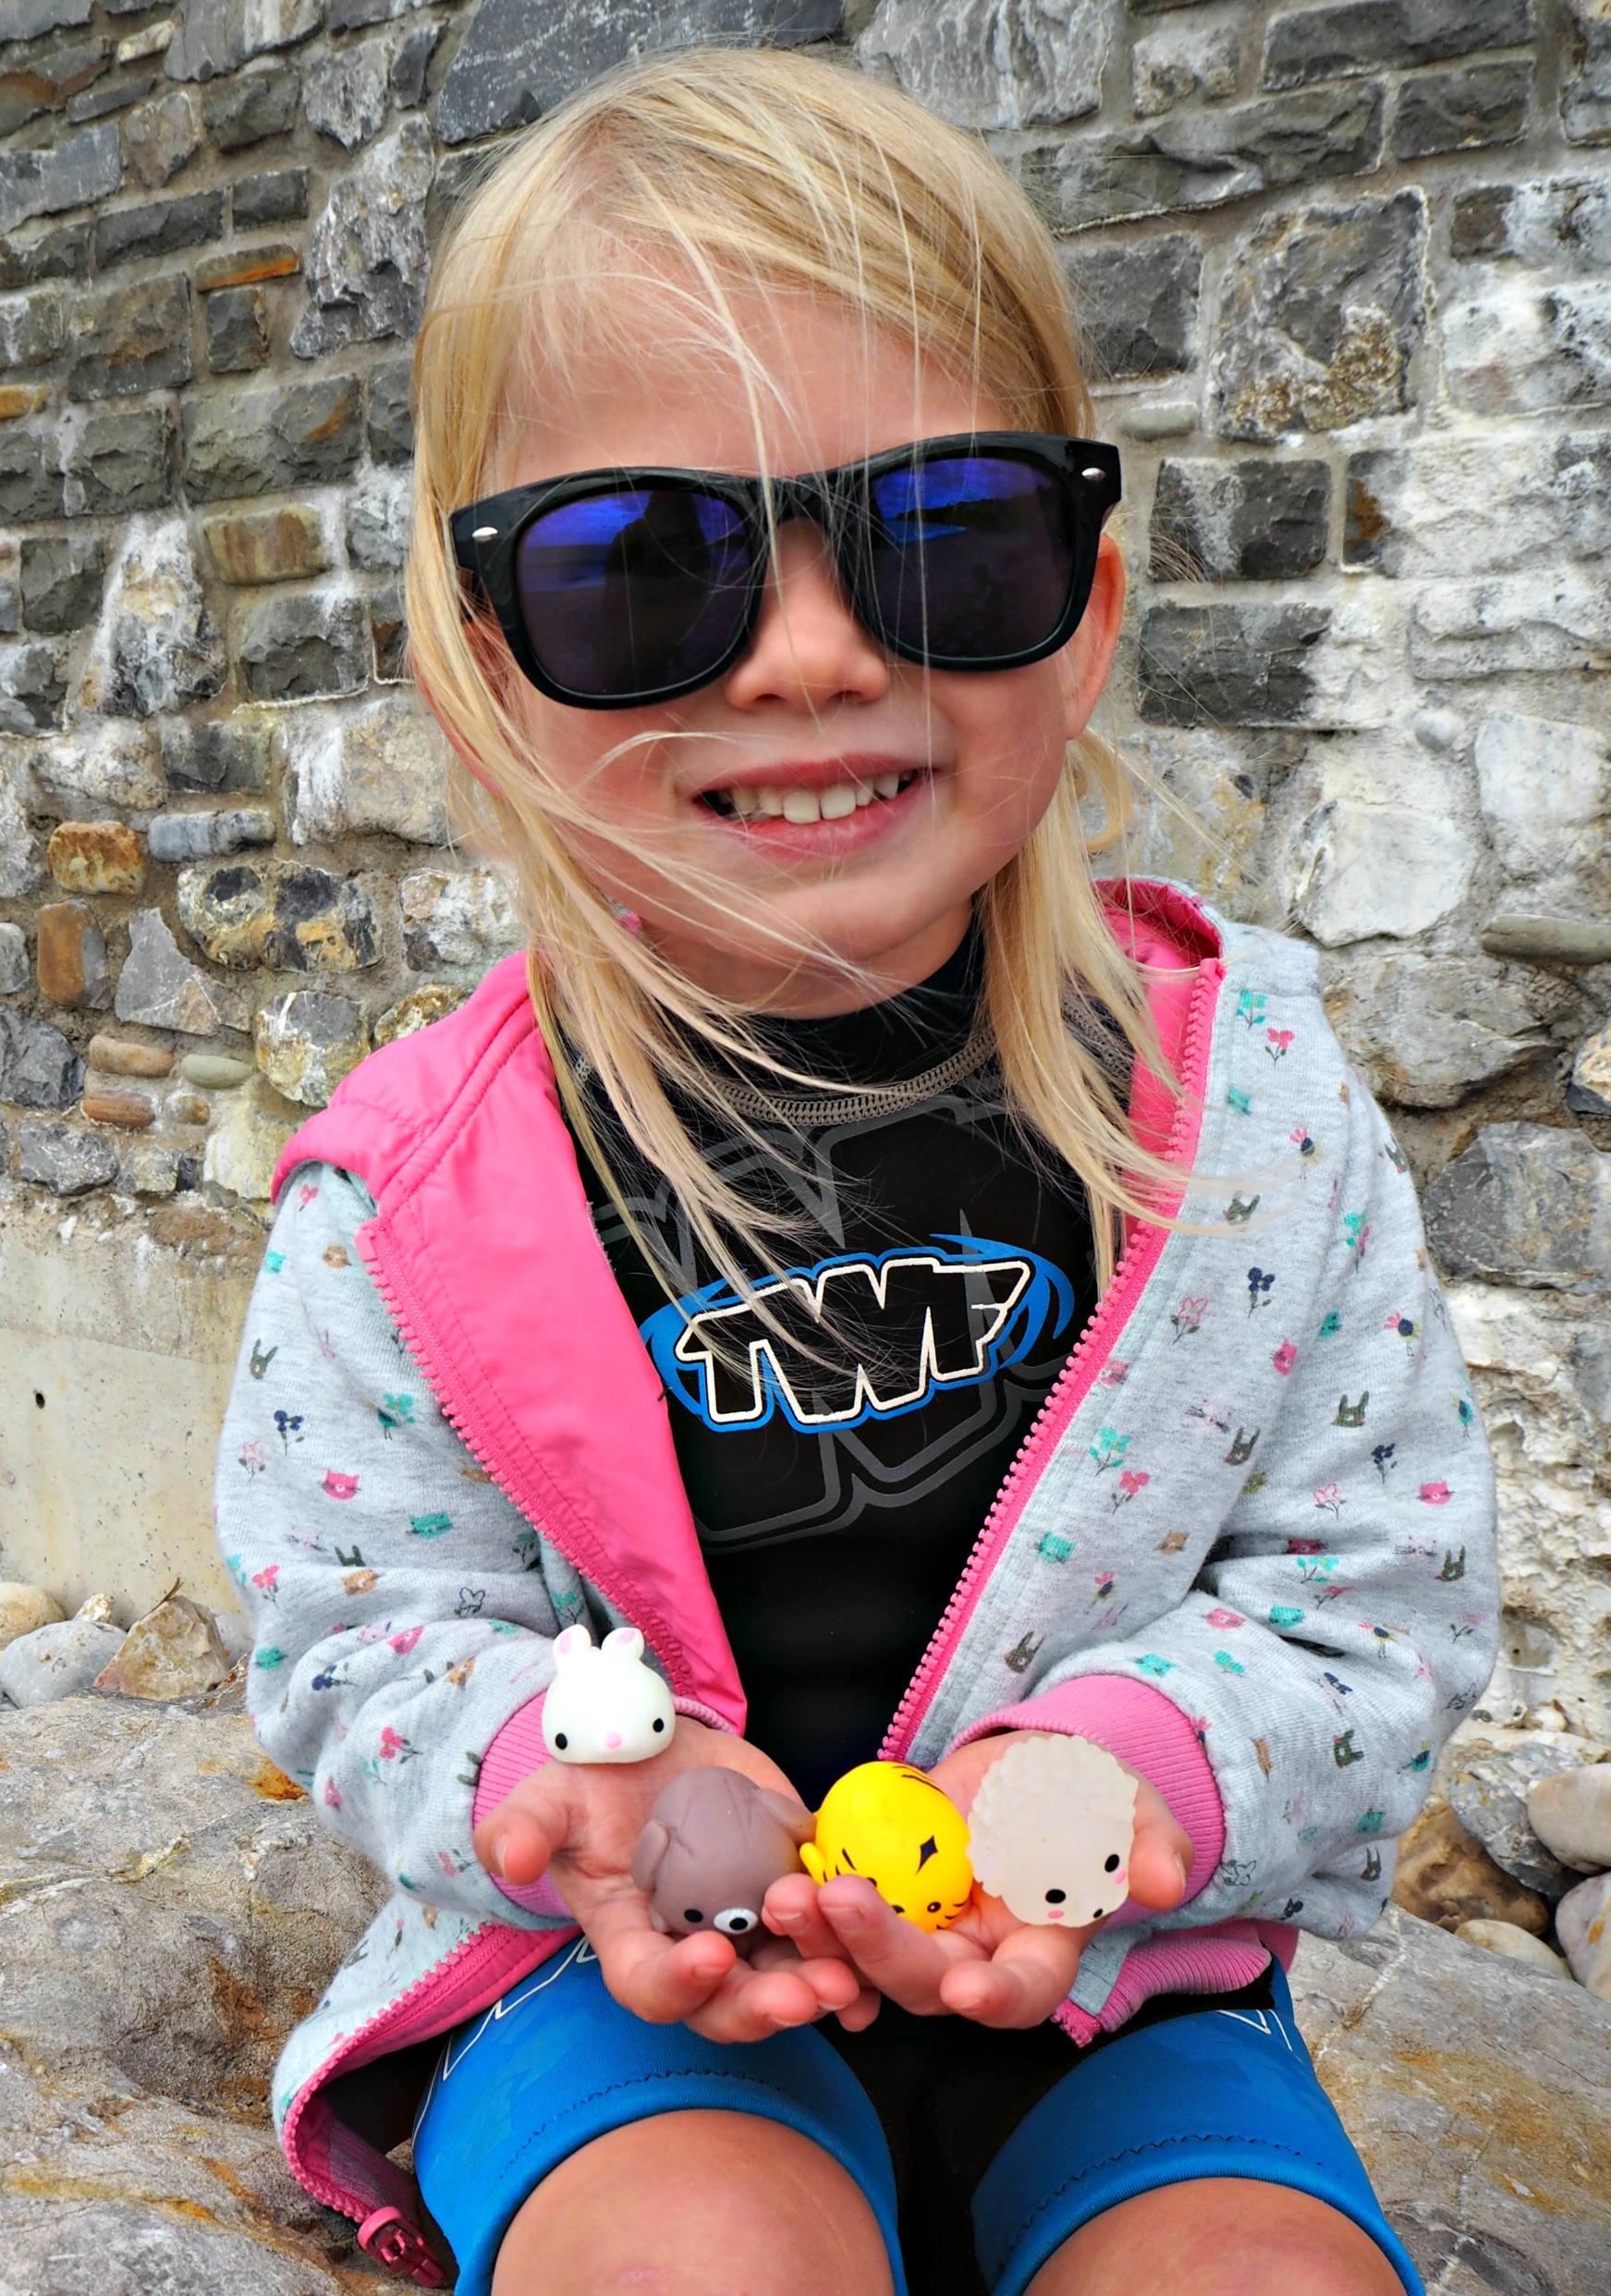 Moj Moj Tiny Toys to Fit in your Suitcase - Aria with Moj toys